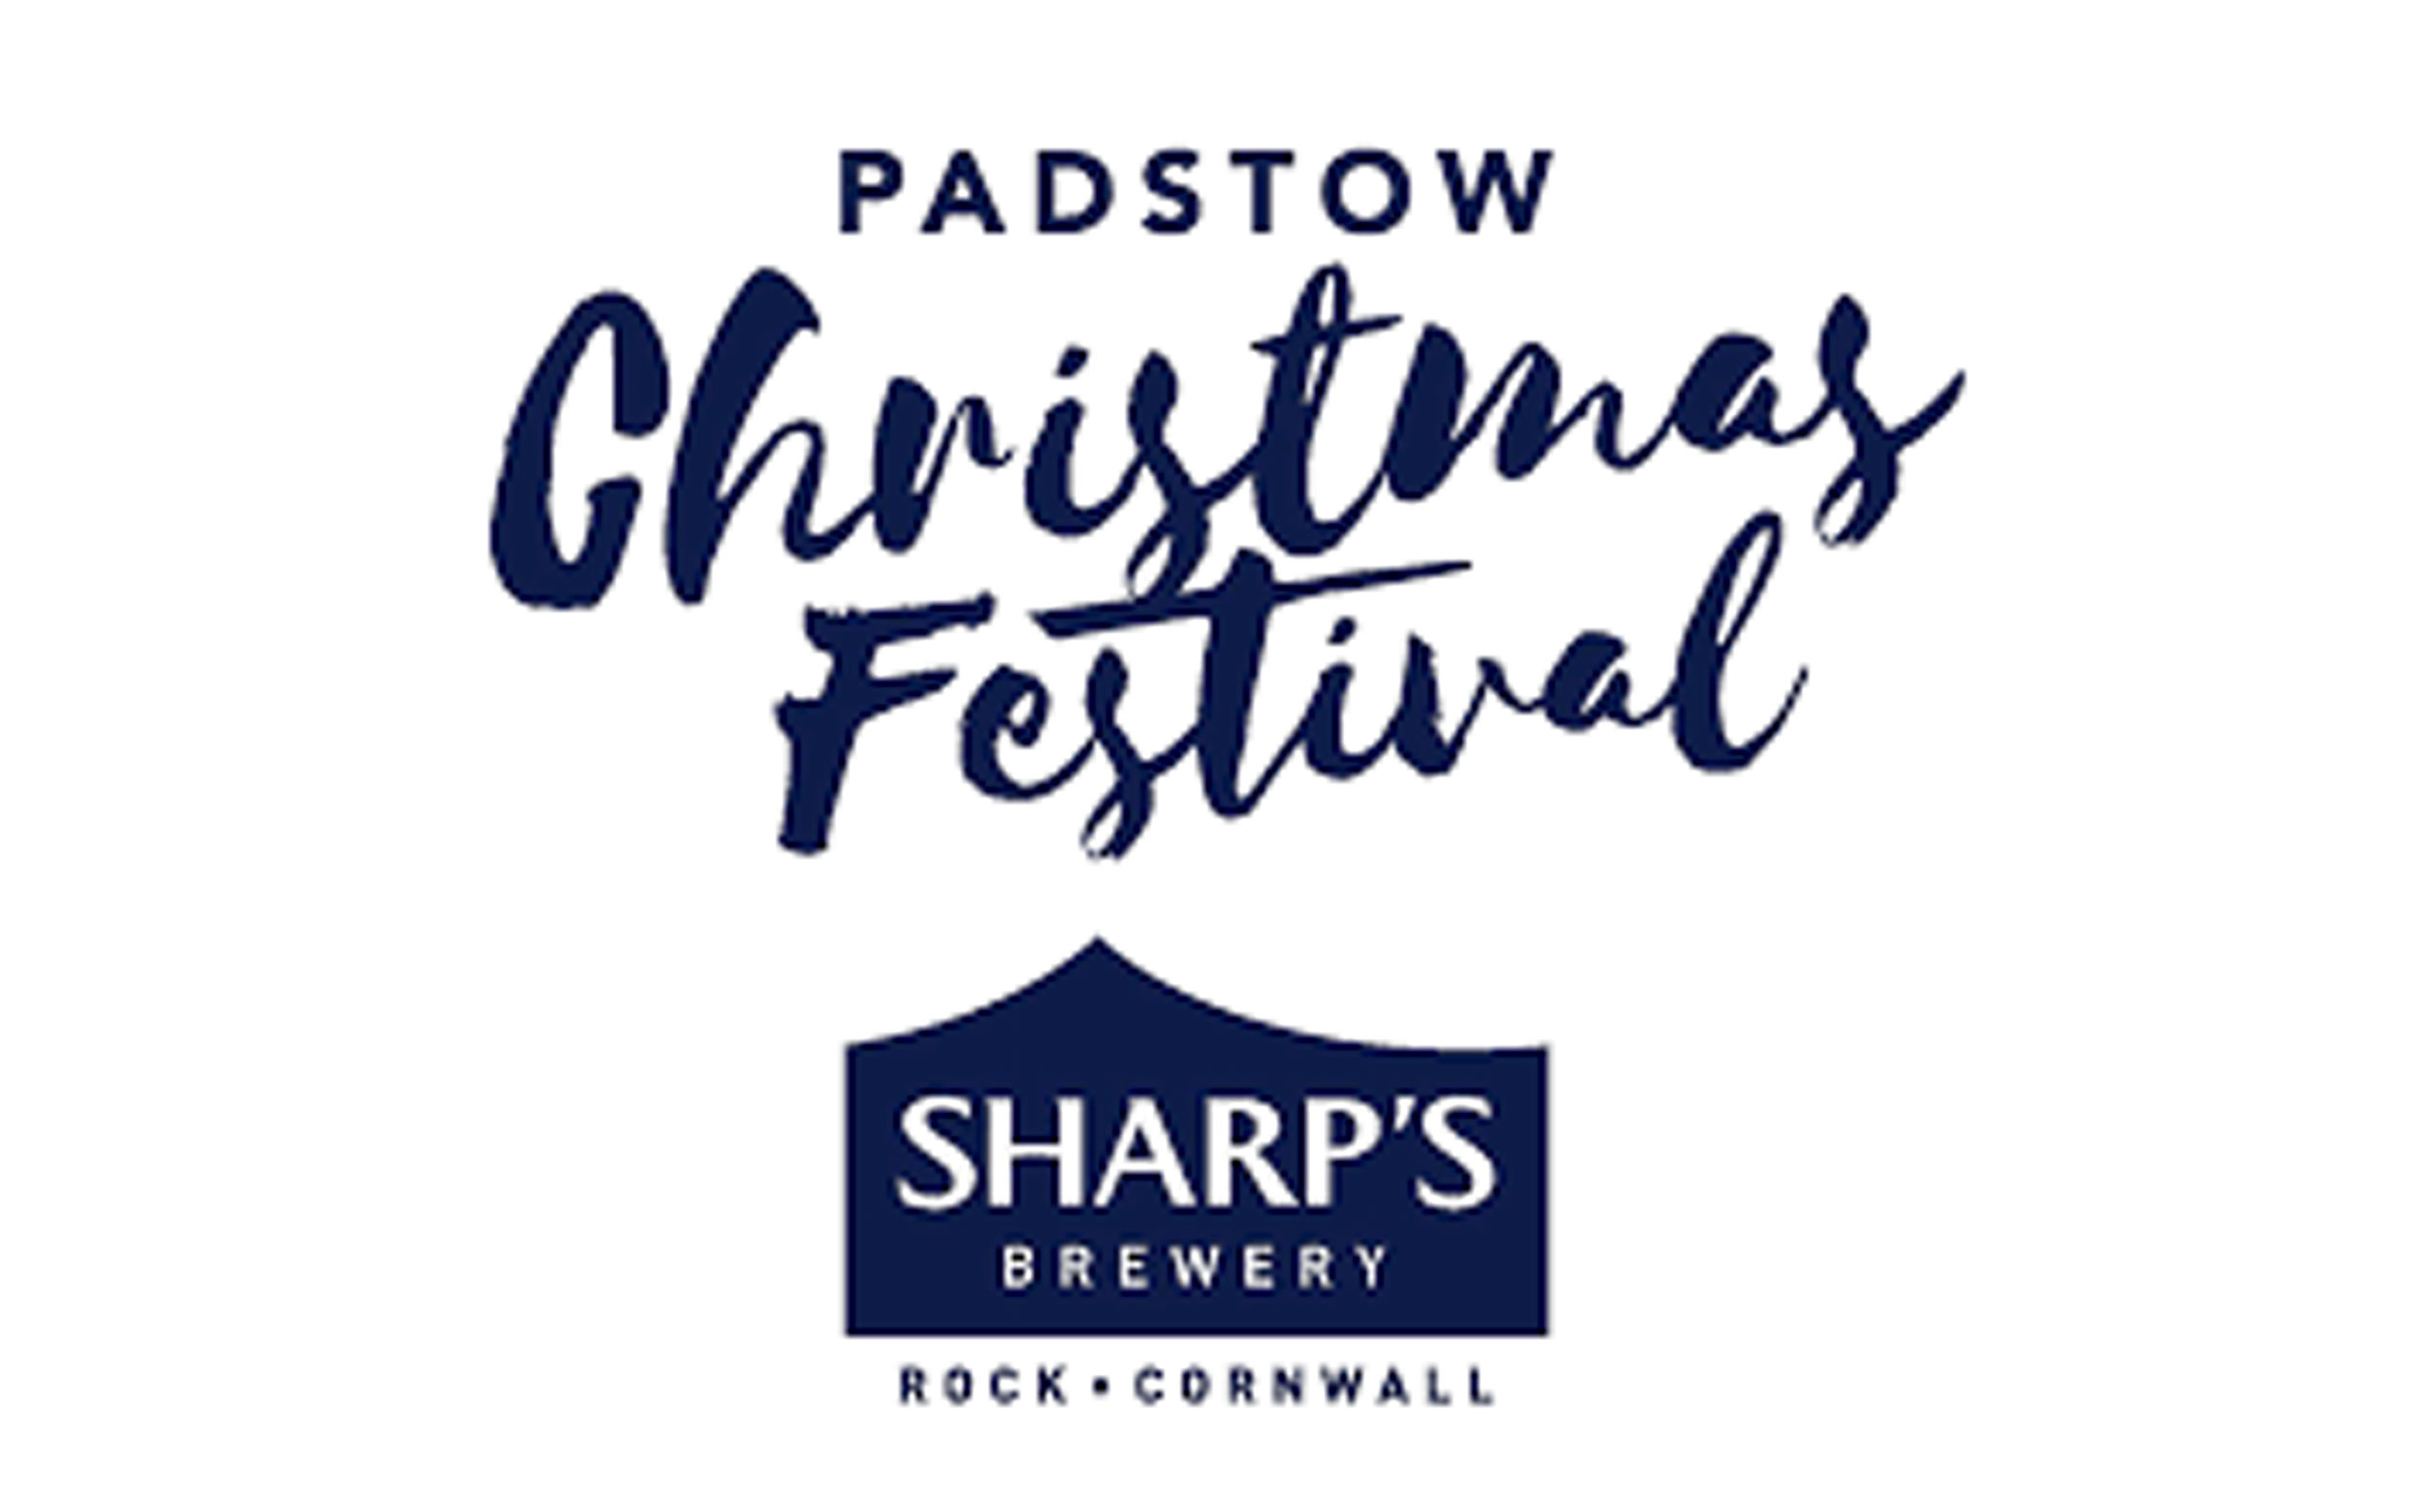 Padstow-Christmas-Festival.jpg